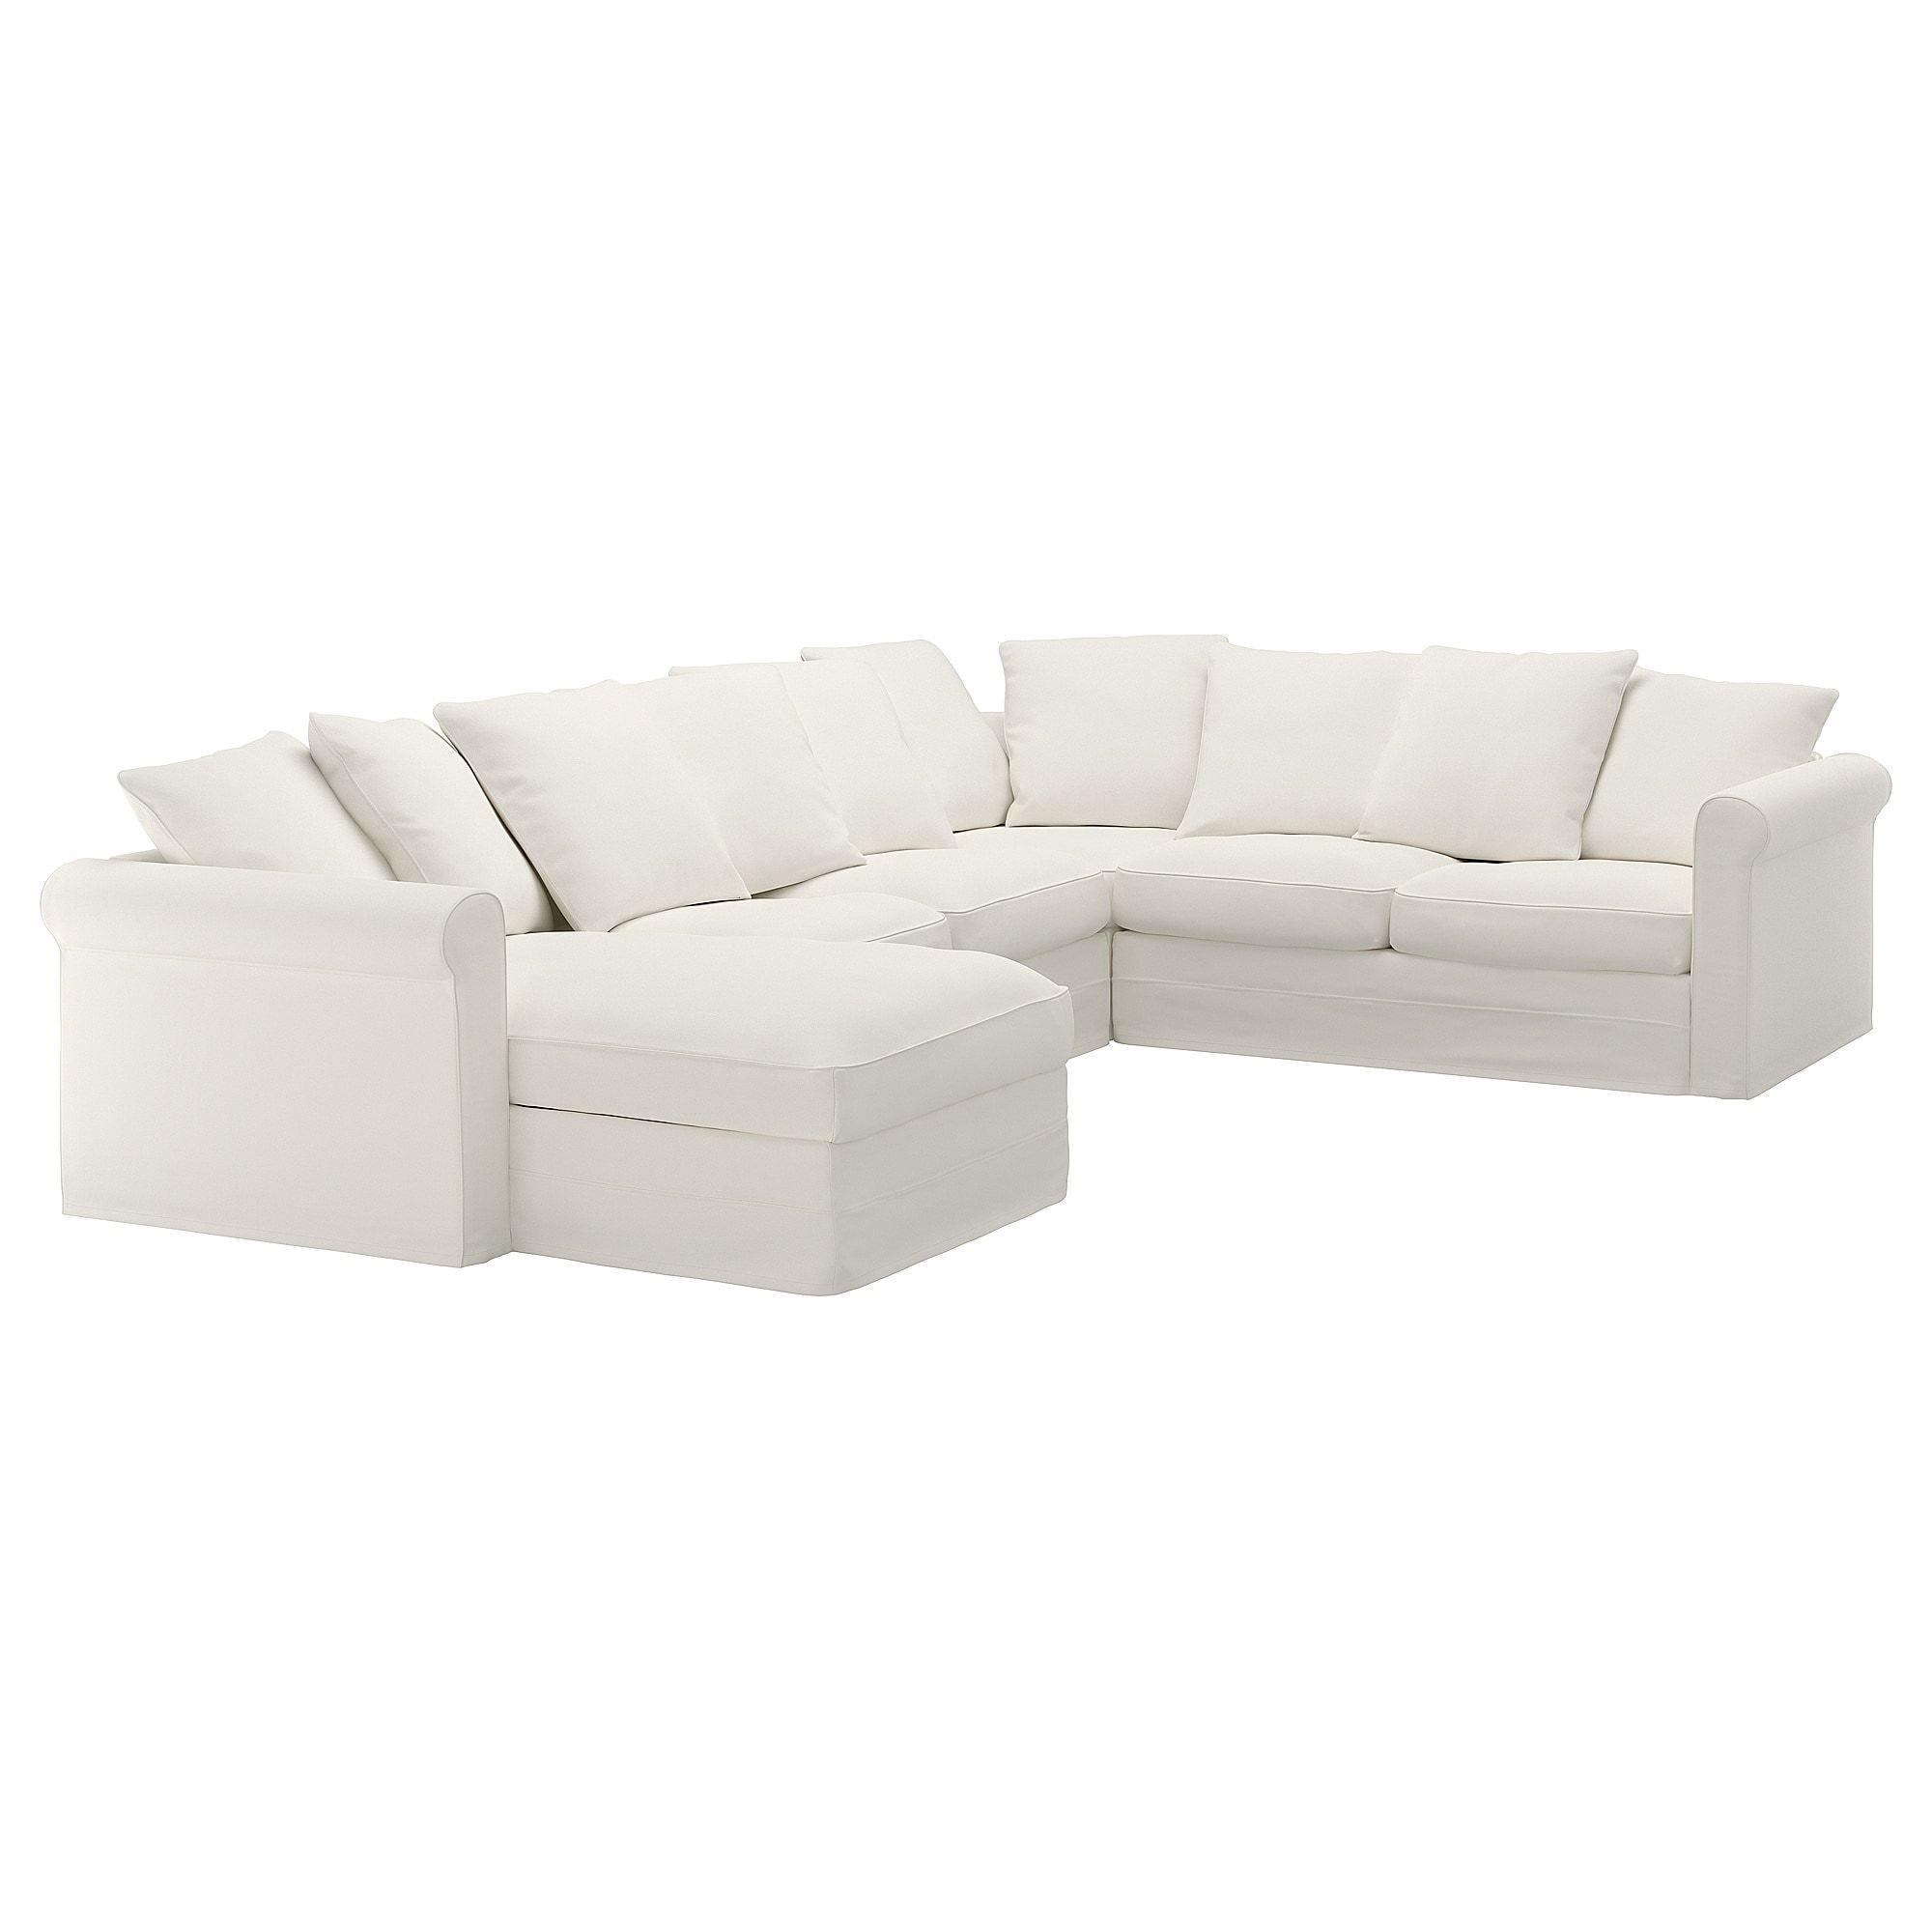 Gronlid Sectional 5 Seat Corner With Chaise Inseros White Sofa En Forma De U Telas Sofas Sofa Ikea